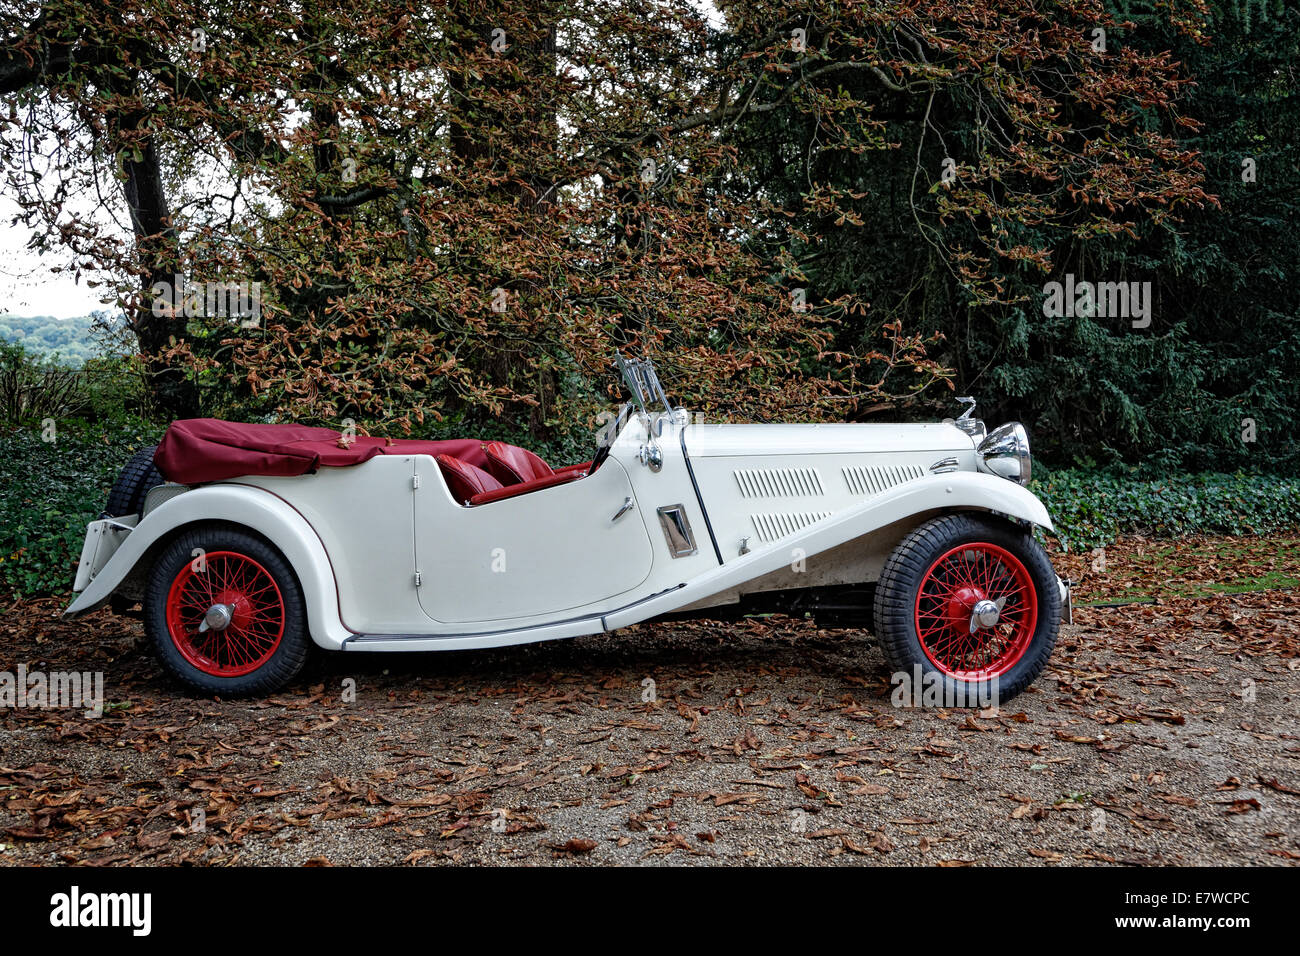 1934 Triumph Motor Company 39 Gloria 39 Monte Carlo Tourer 4